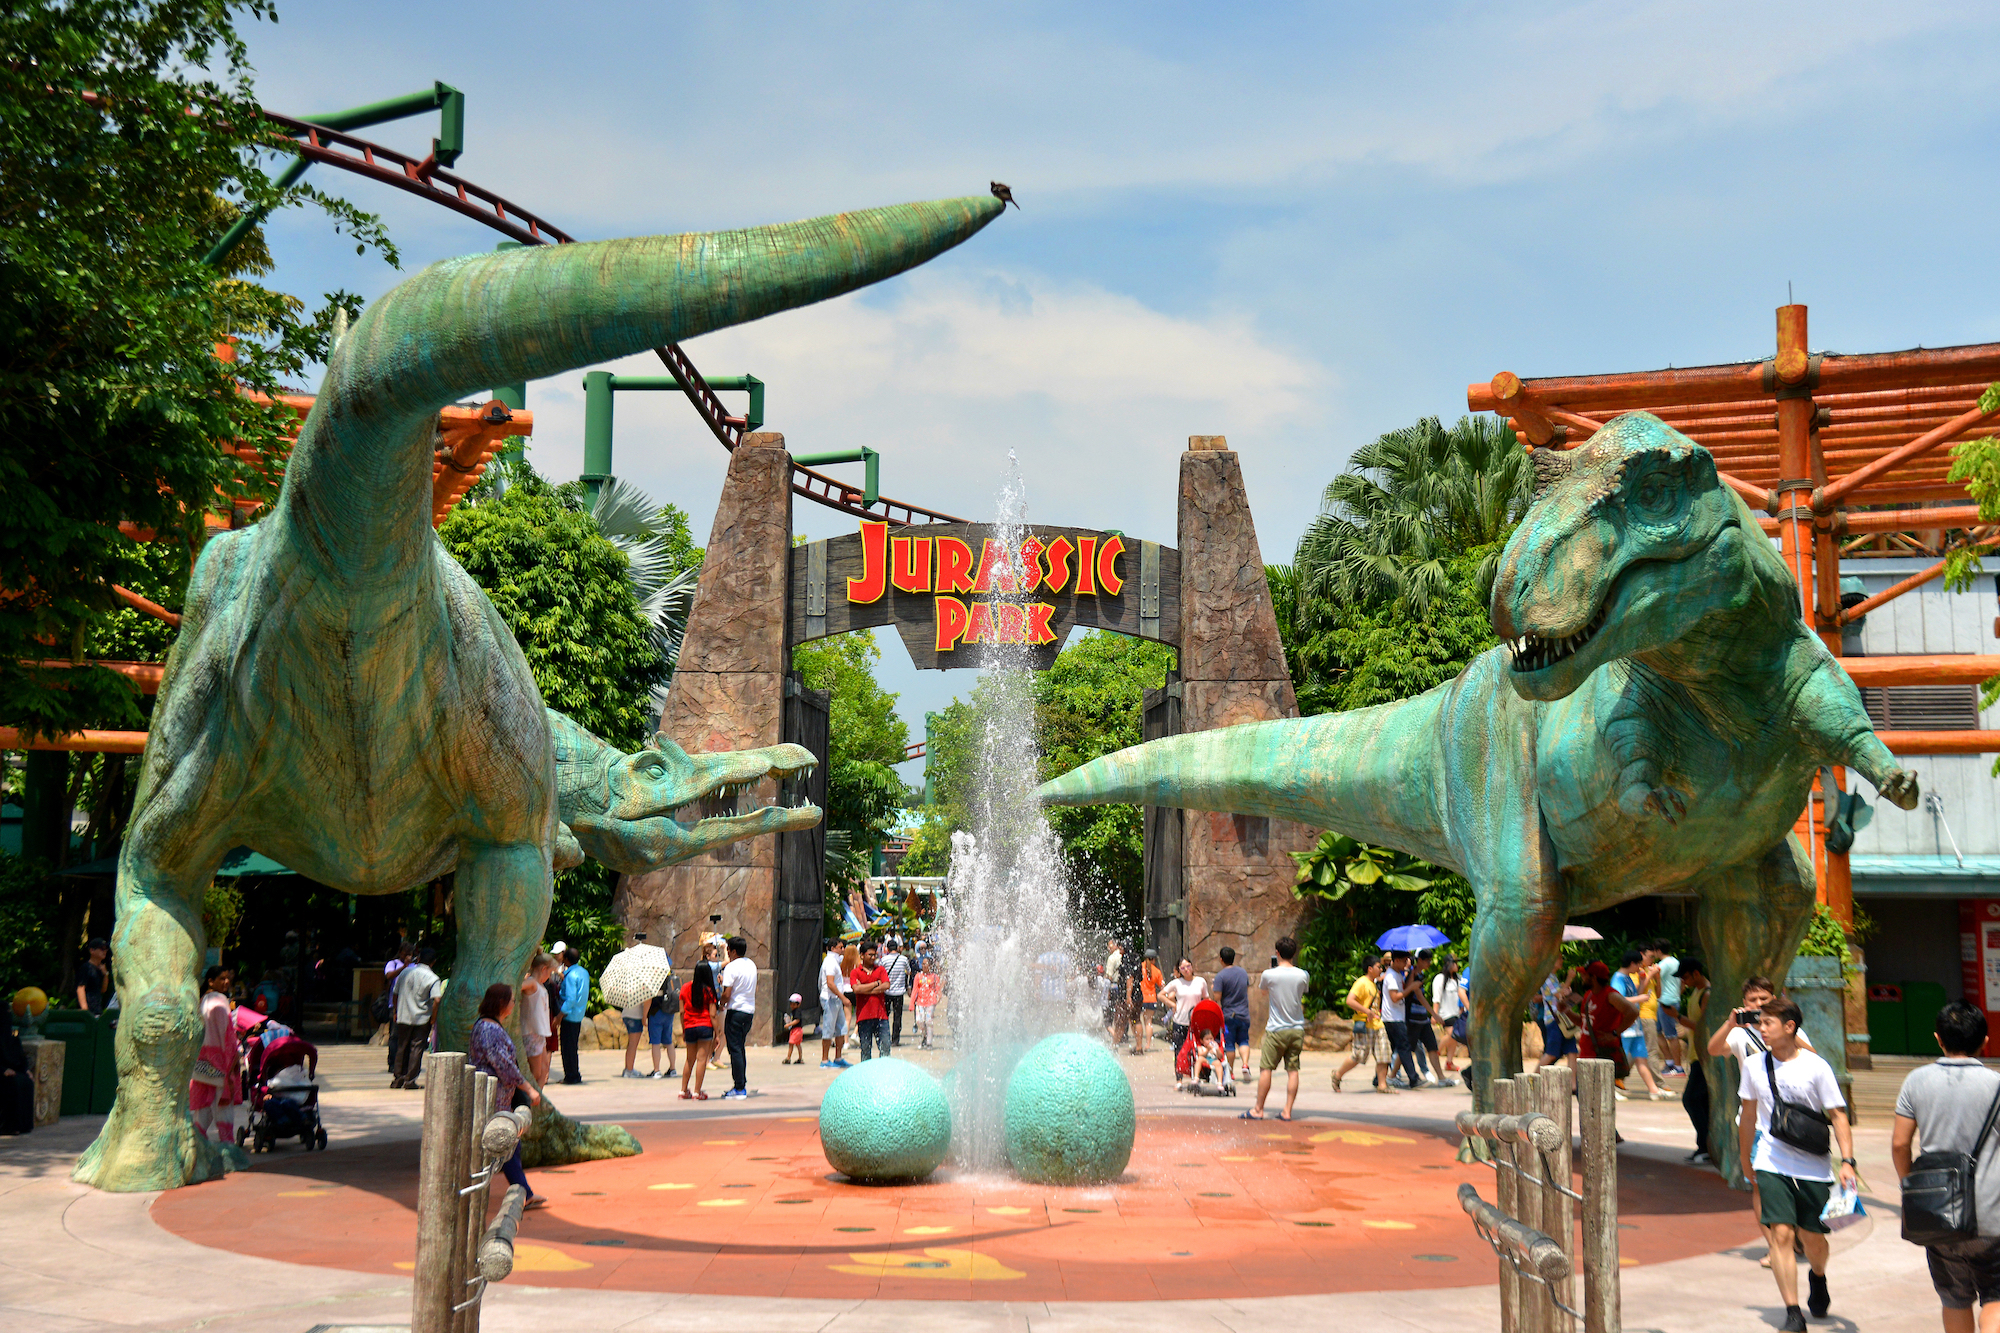 Jurassic Park, Universal Studios Singapore